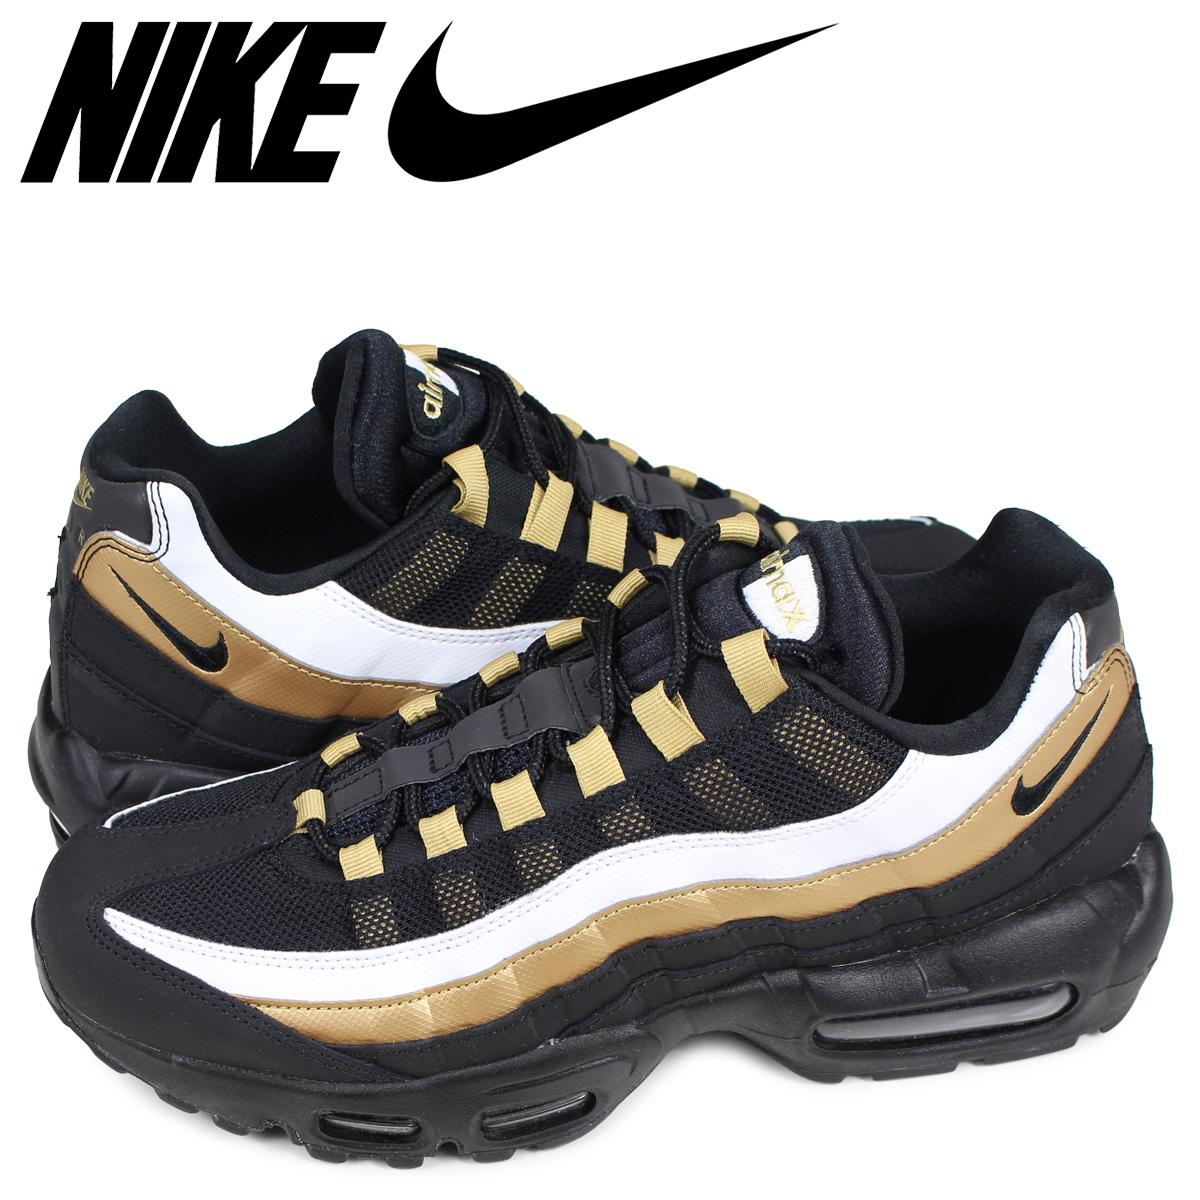 NIKE AIR MAX 95 OG Kie Ney AMAX 95 sneakers men black black AT2865 002